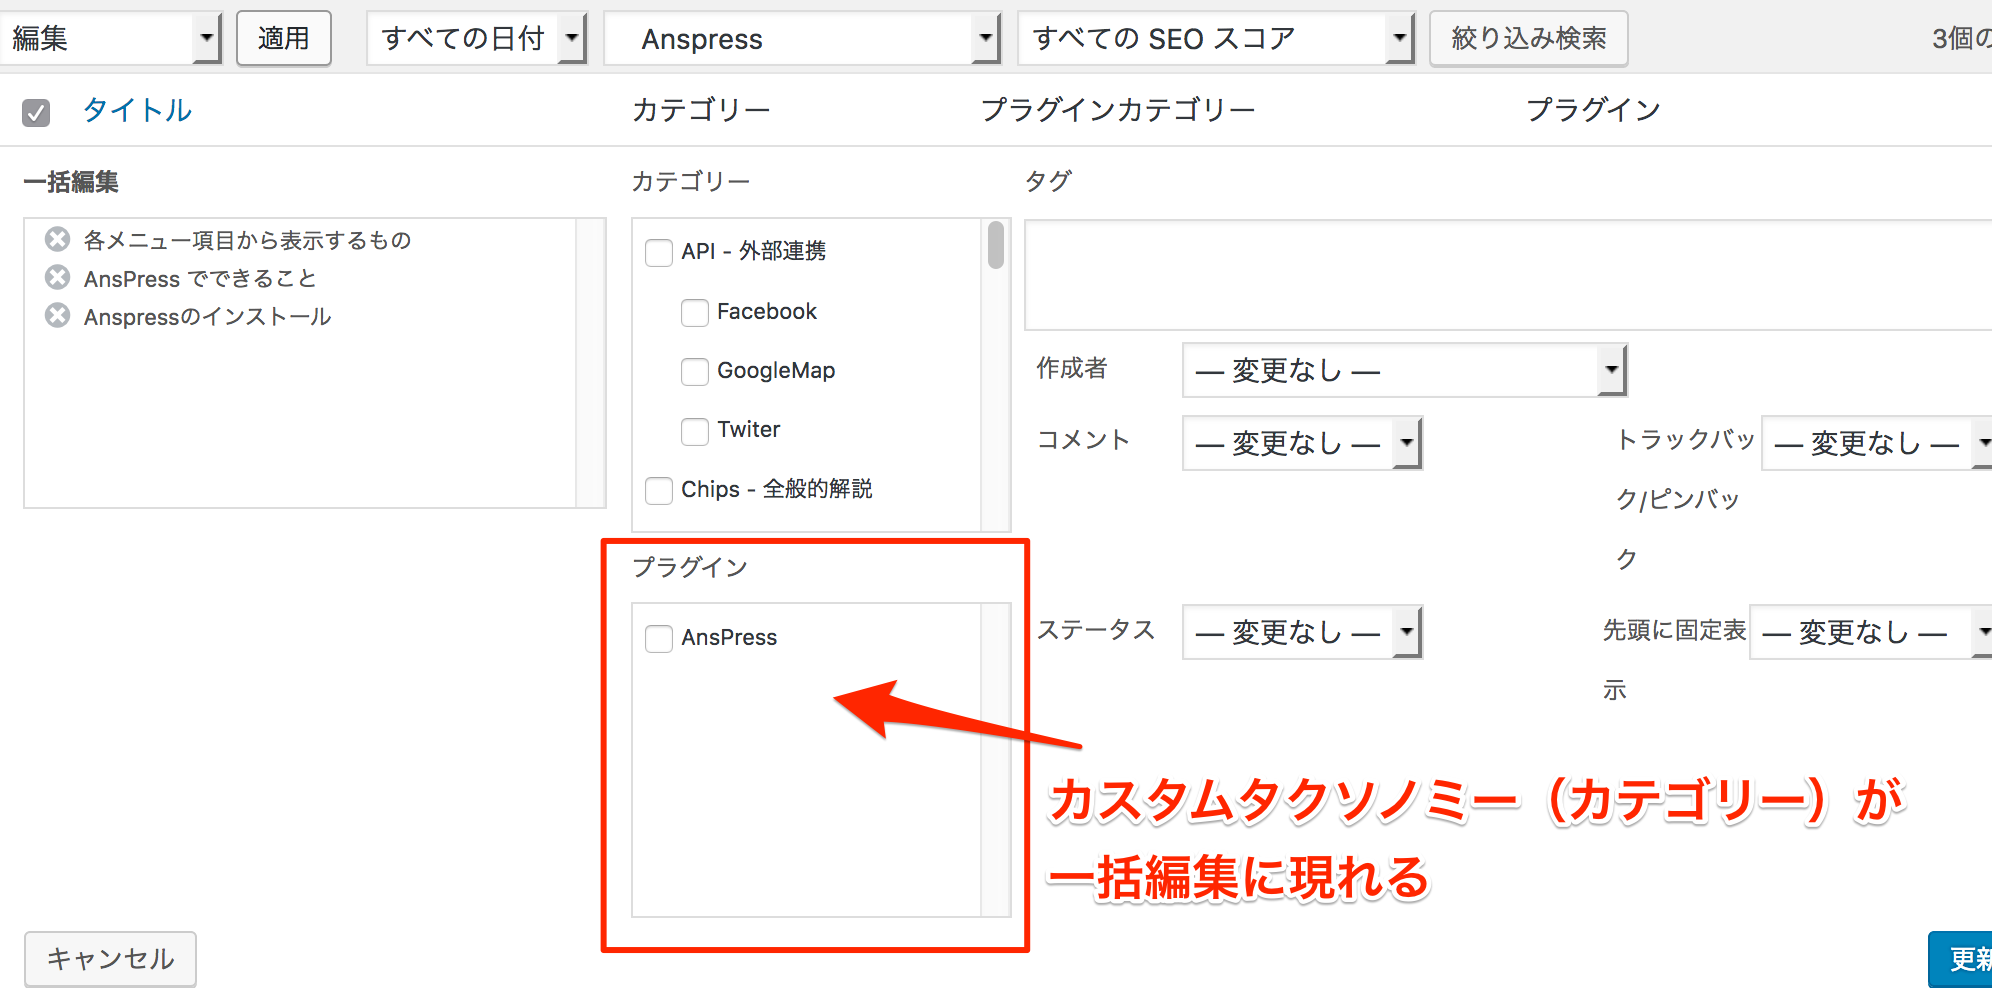 Custom Post Type UI のTaxonomiesの設定でTrueにしておきたい項目